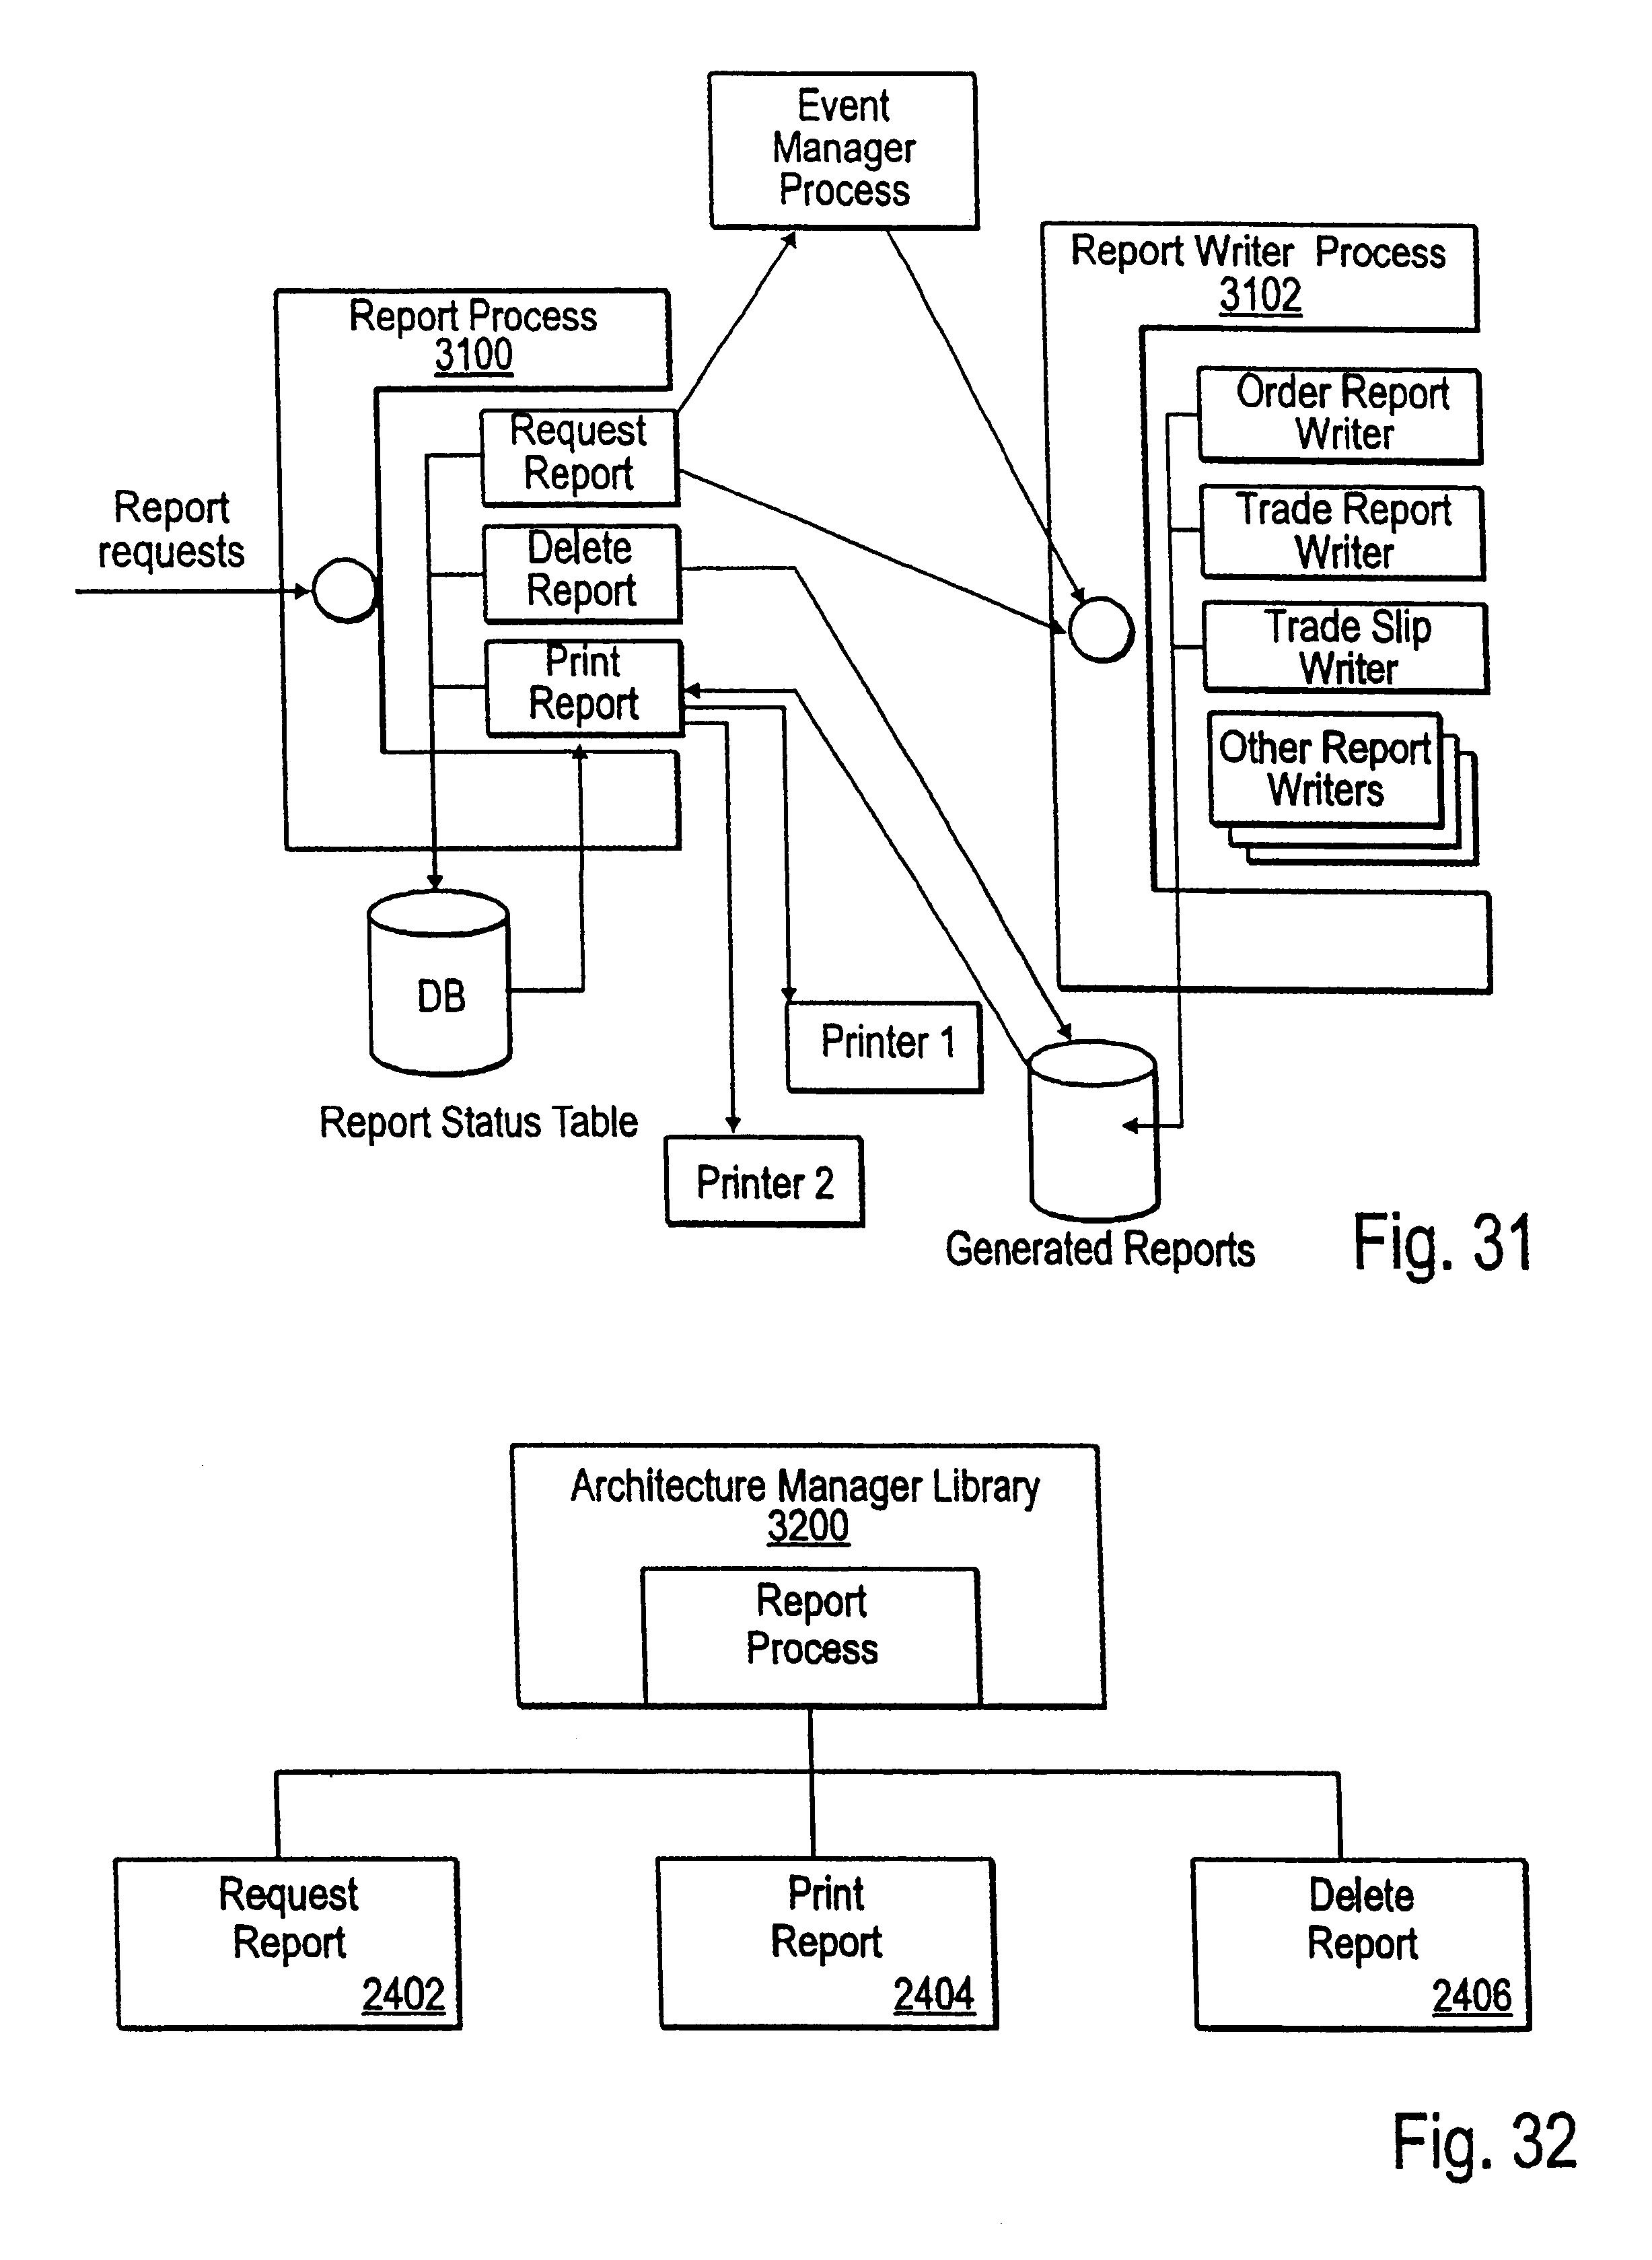 Patent US 6,601,192 B1